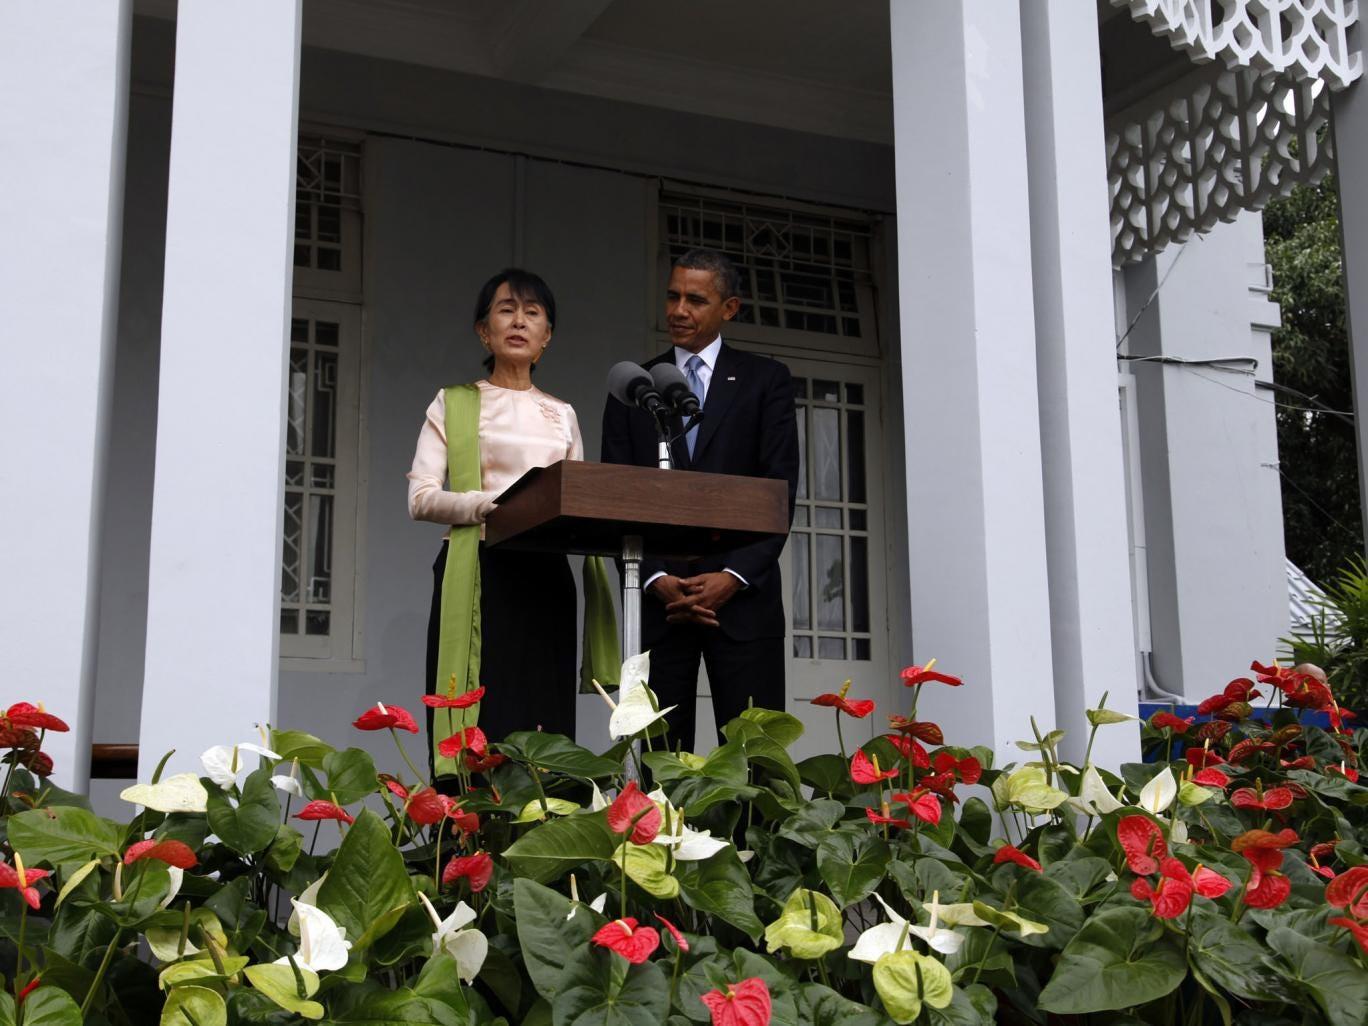 US President Barack Obama (R) listens to Myanmar opposition leader Aung San Suu Kyi at Suu kui's residence in Yangon on November 19, 2012.